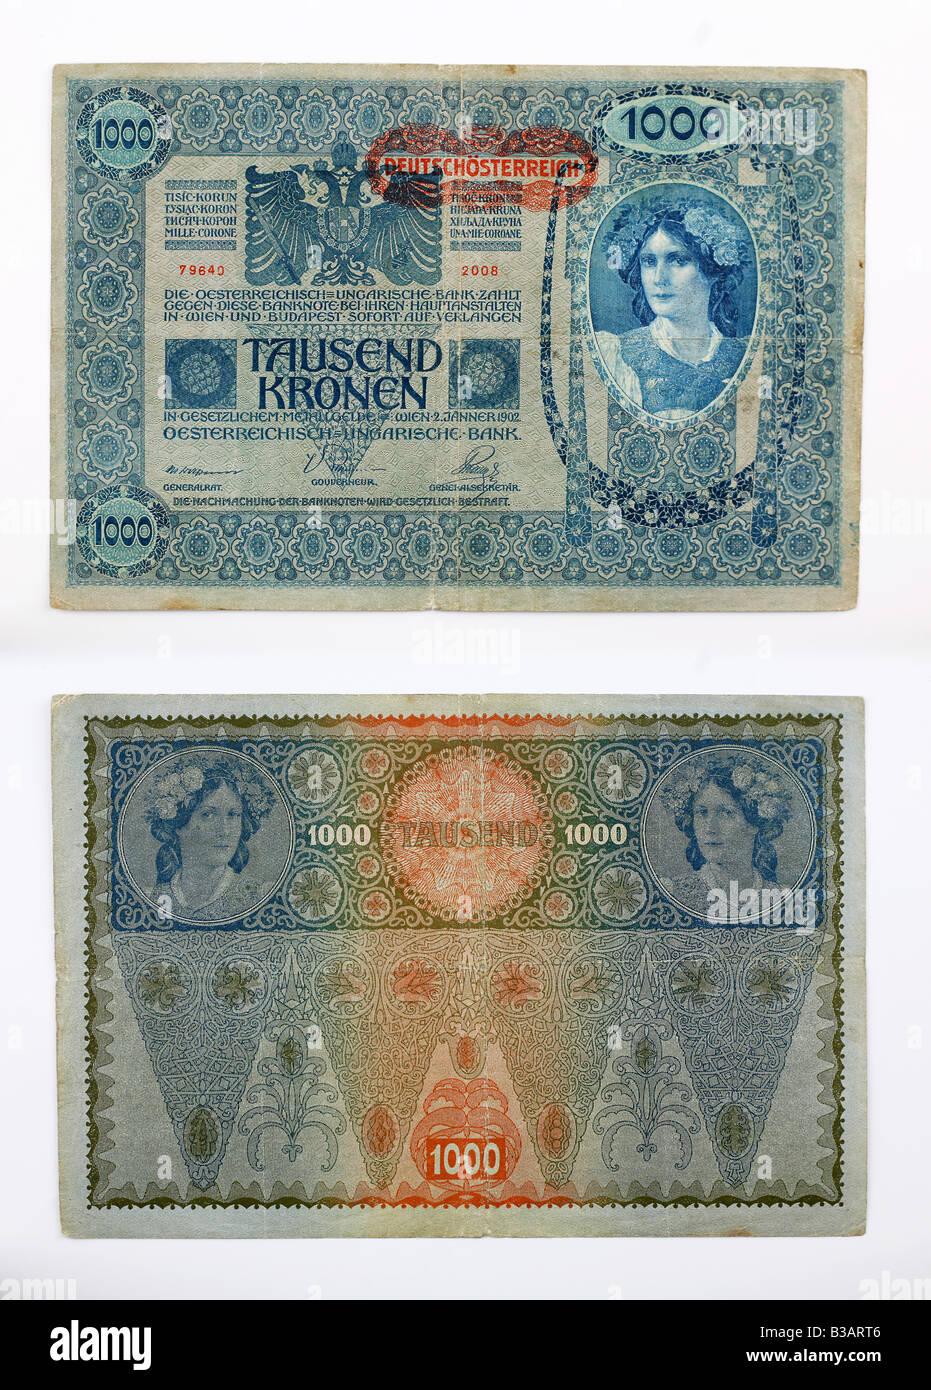 Paper money cash currency AUSTRIA TAUSEND KRONEN - Stock Image